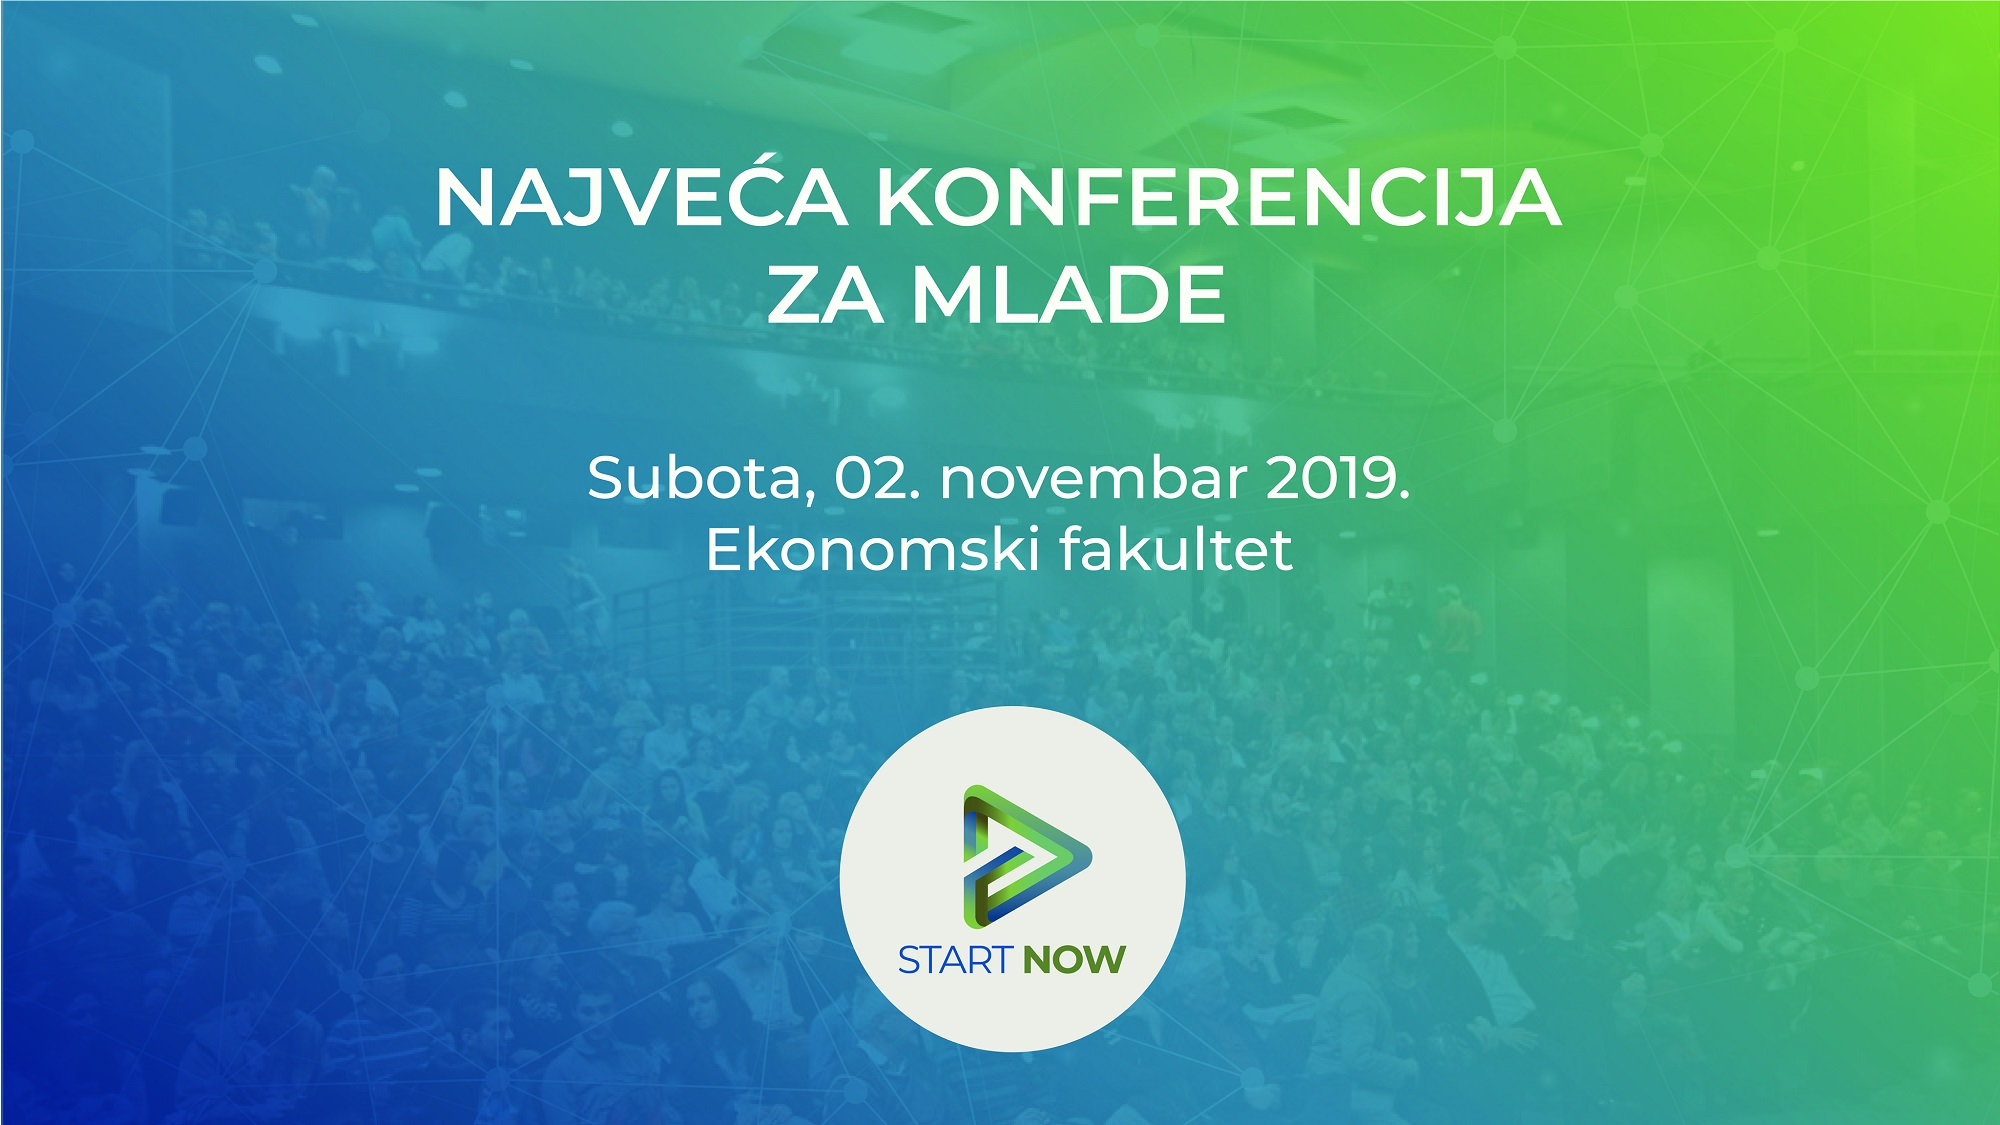 Prijavi se na Start Now konferenciju – Budi deo najboljih